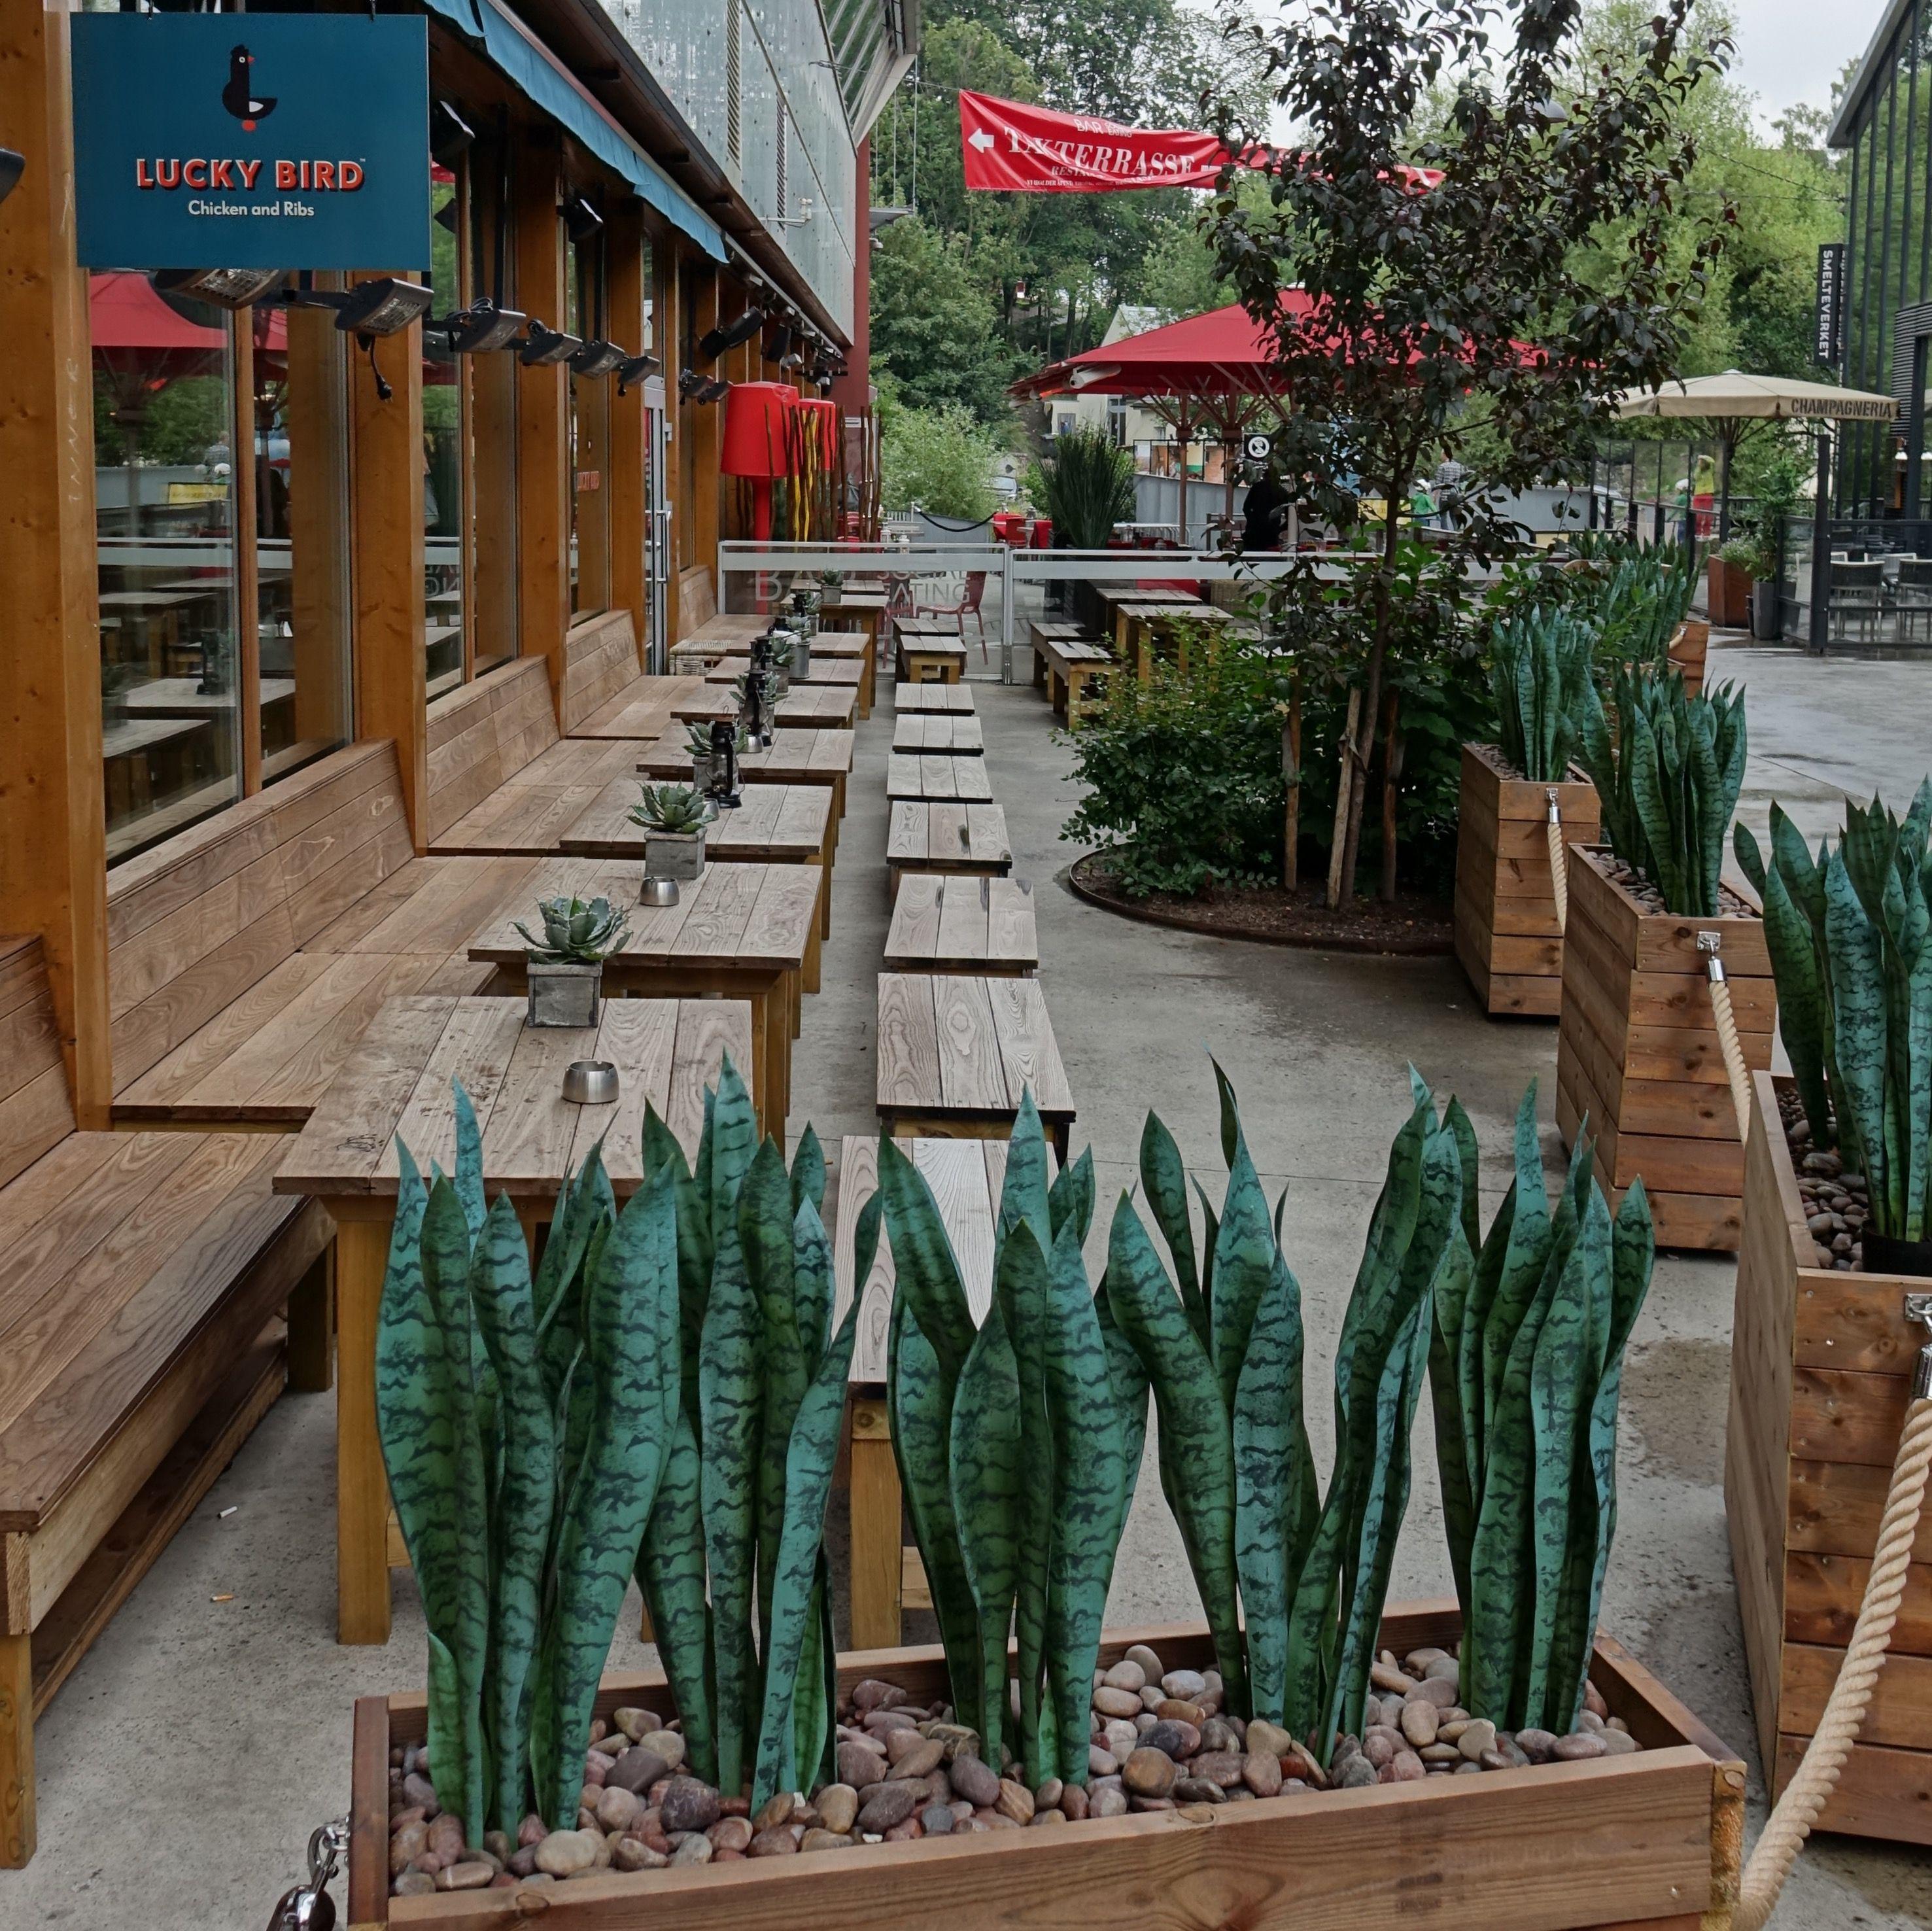 oslo | norge | vulkan | lucky bird restaurant